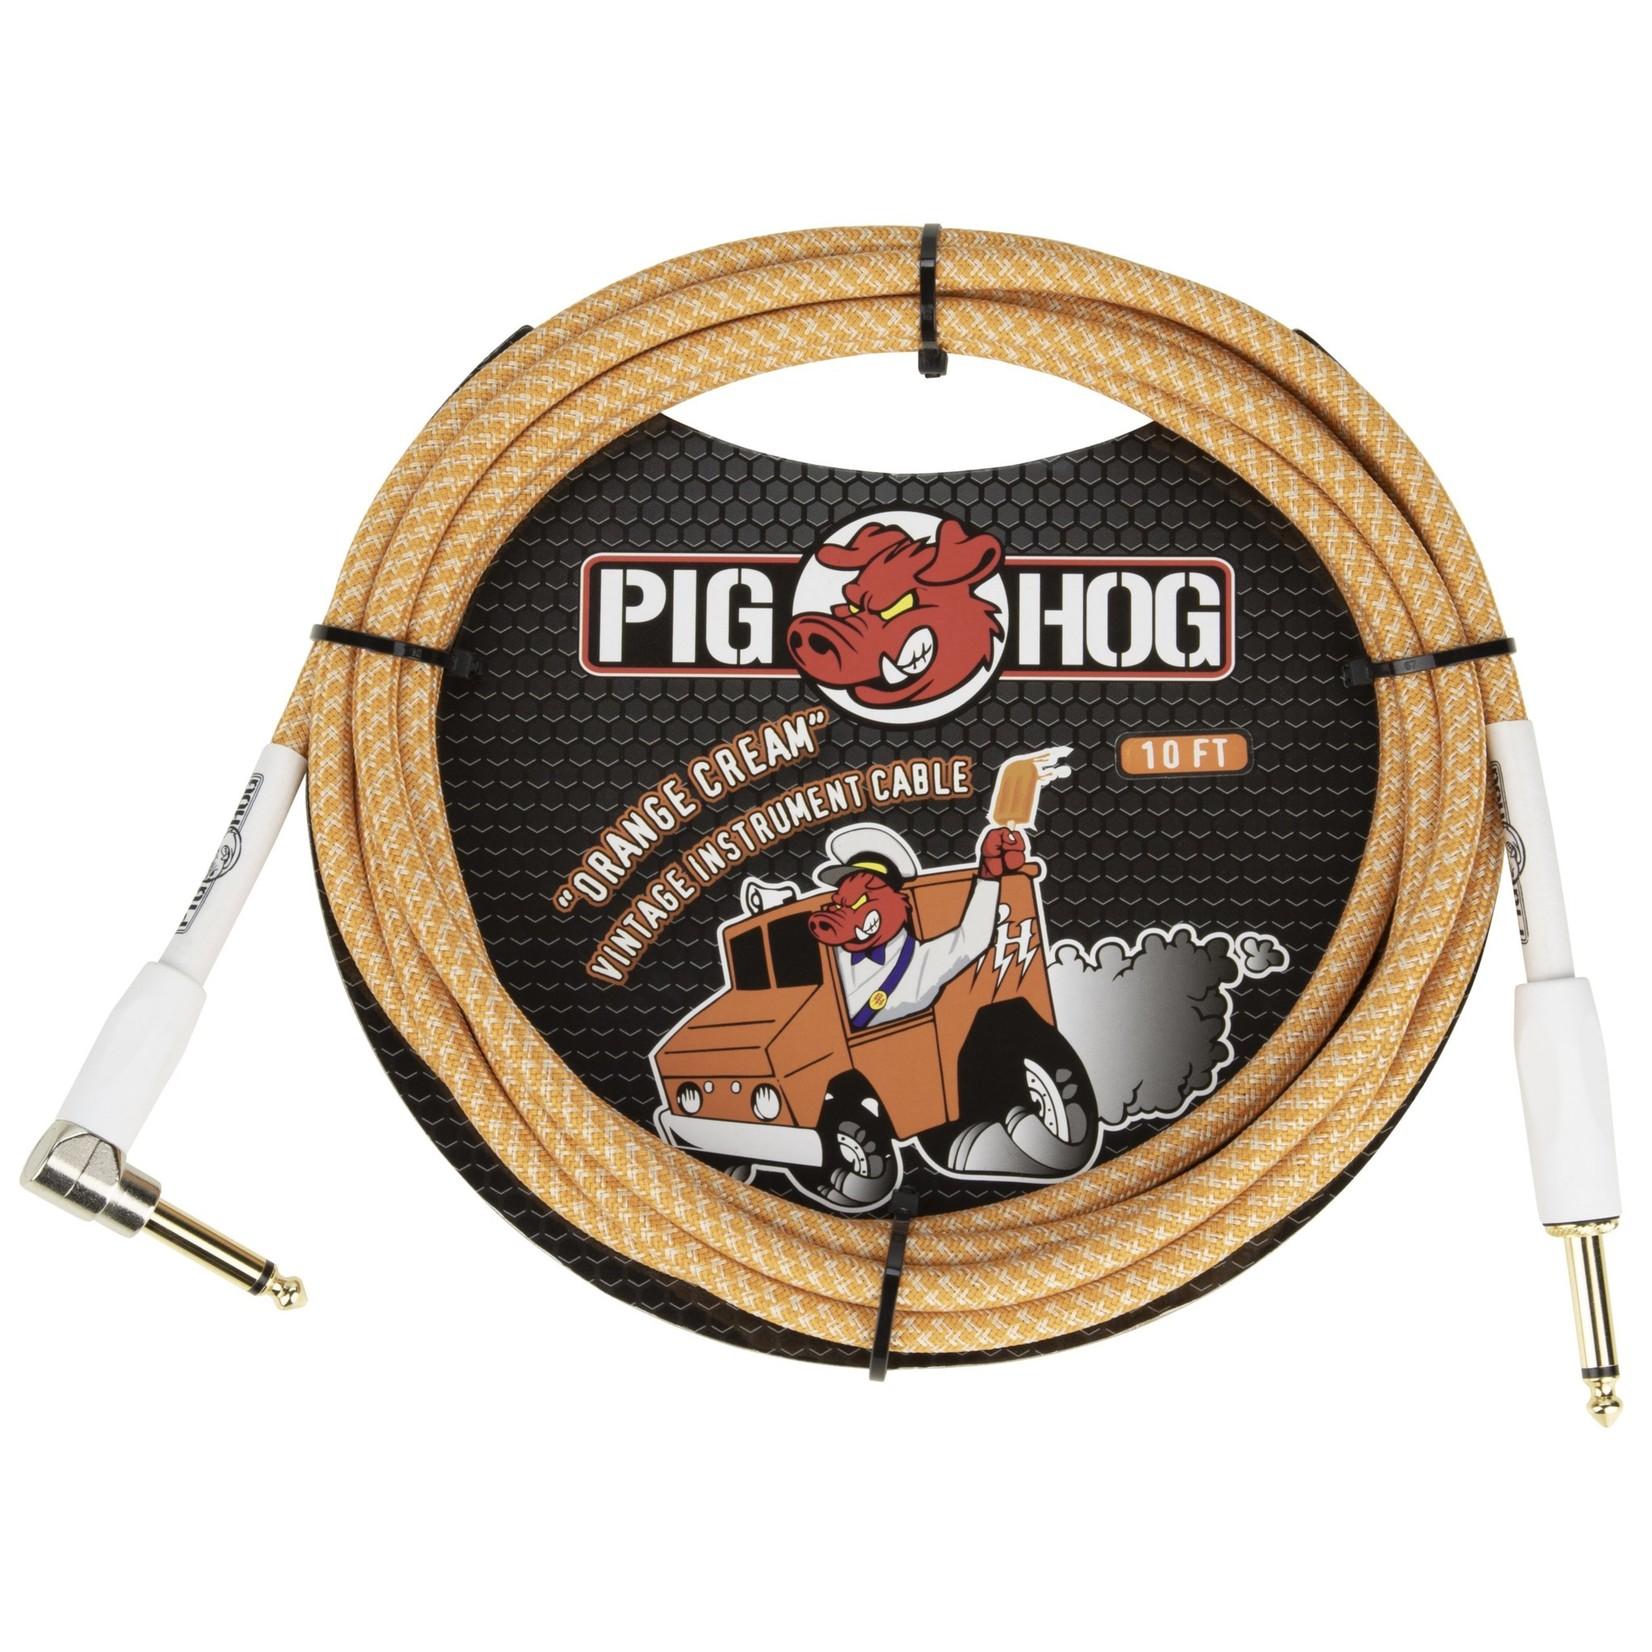 "Pig Hog Pig Hog Tour Grade Vintage Woven 10-Foot Instrument Cable, Straight-Angle 1/4"" TS, Orange Cream 2.0"